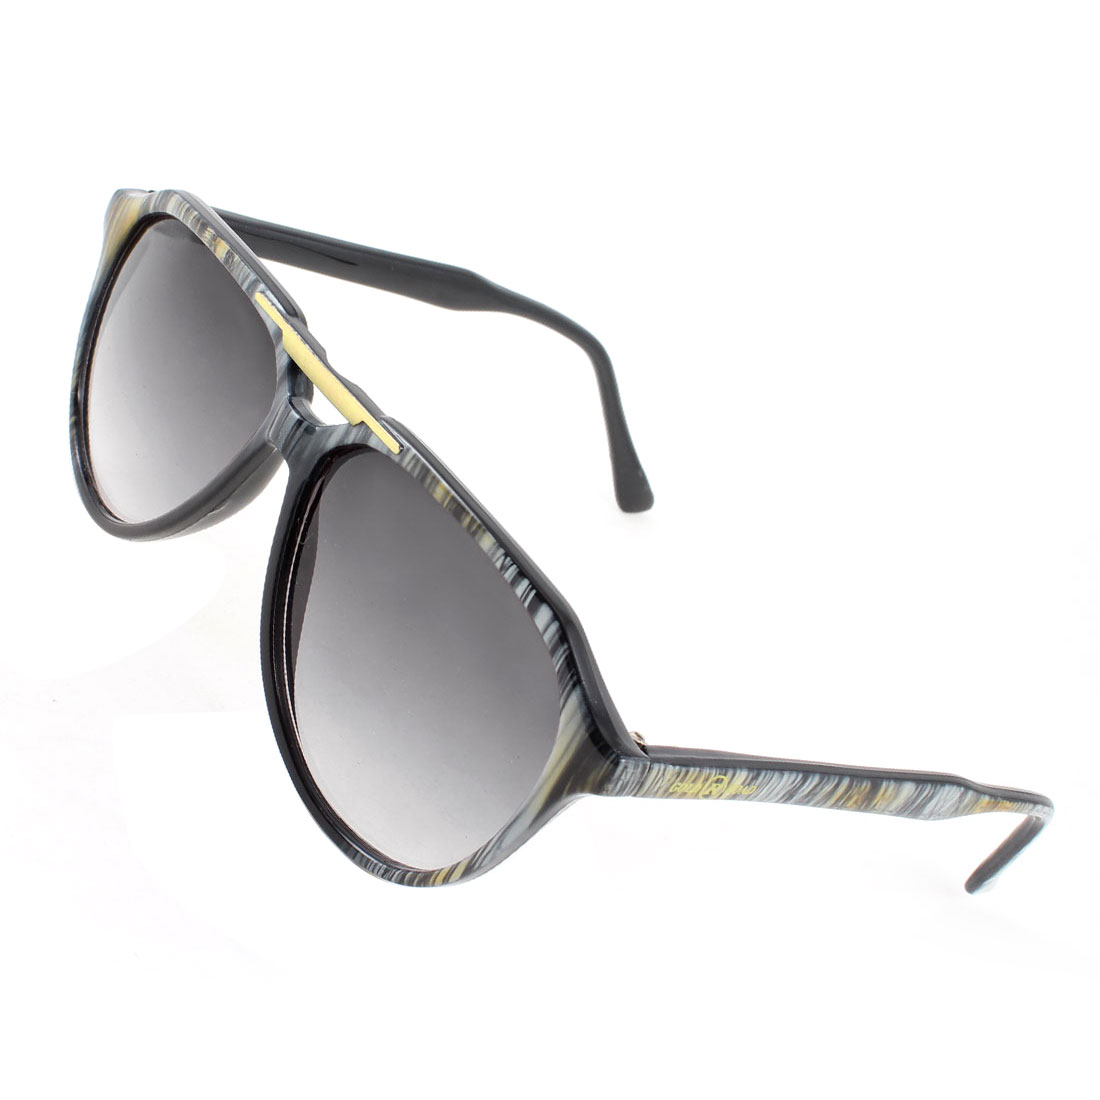 Outdoor Gray Black Stripe Arms Dual Bridge Full Rim Sunglasses for Lady Women